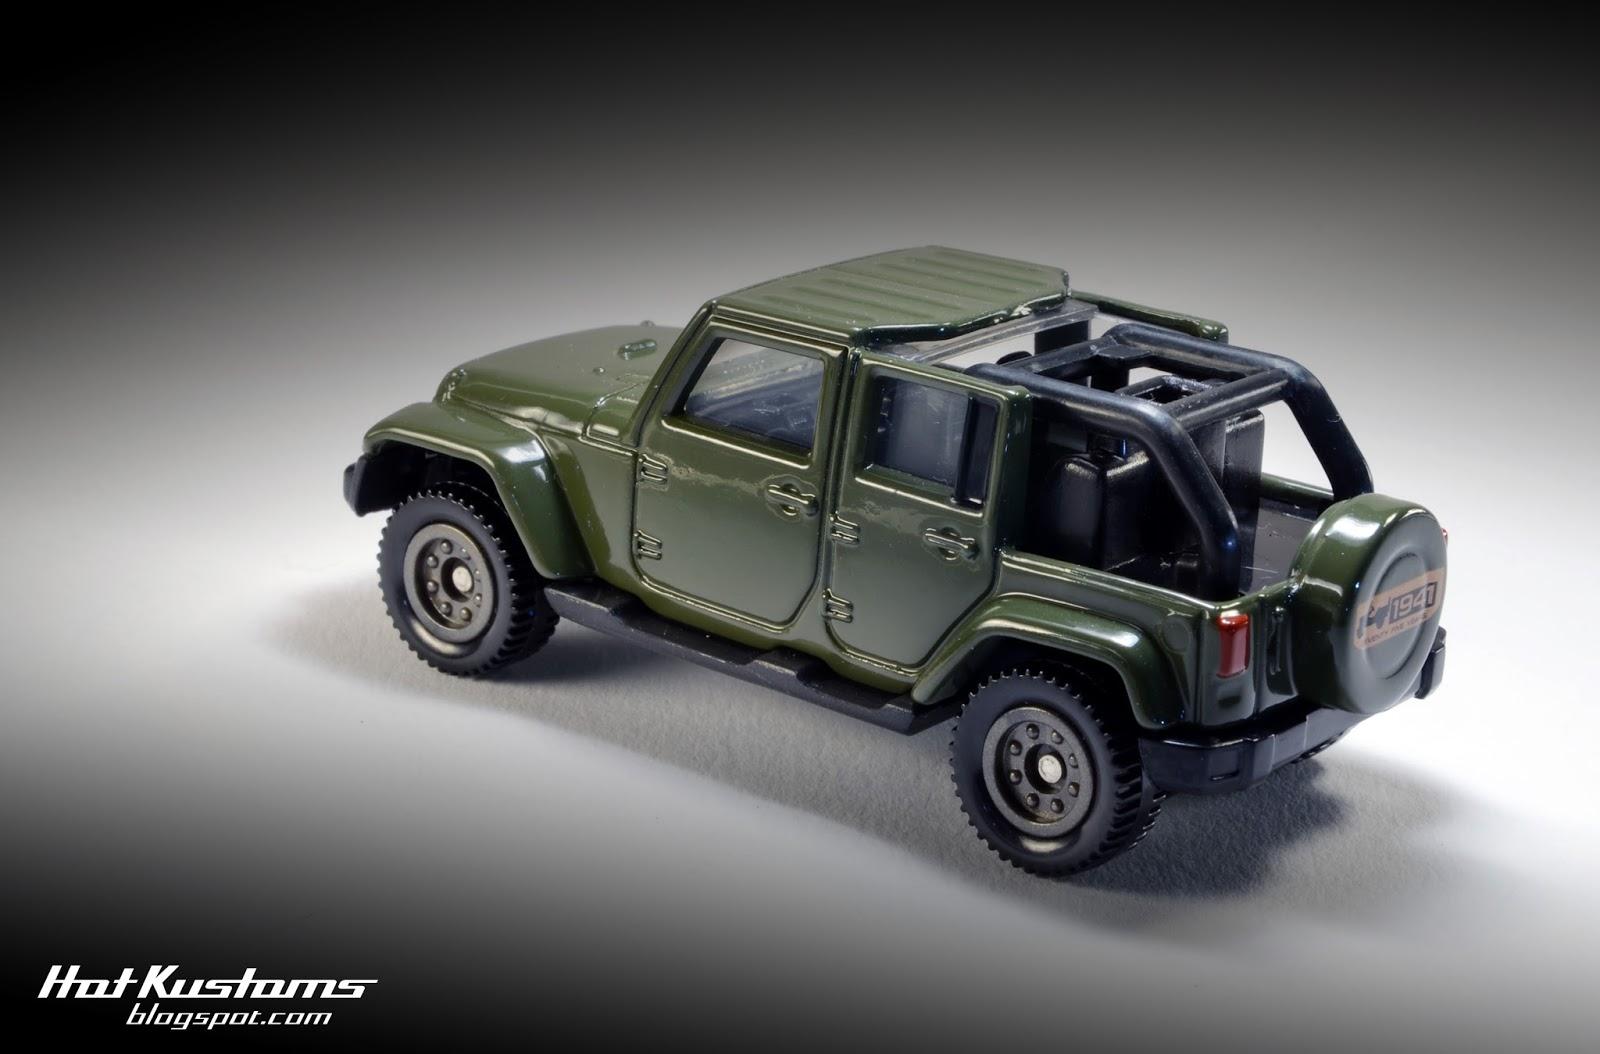 mini hot jeep tomica anniversary cars kustoms edition wrangler dealer